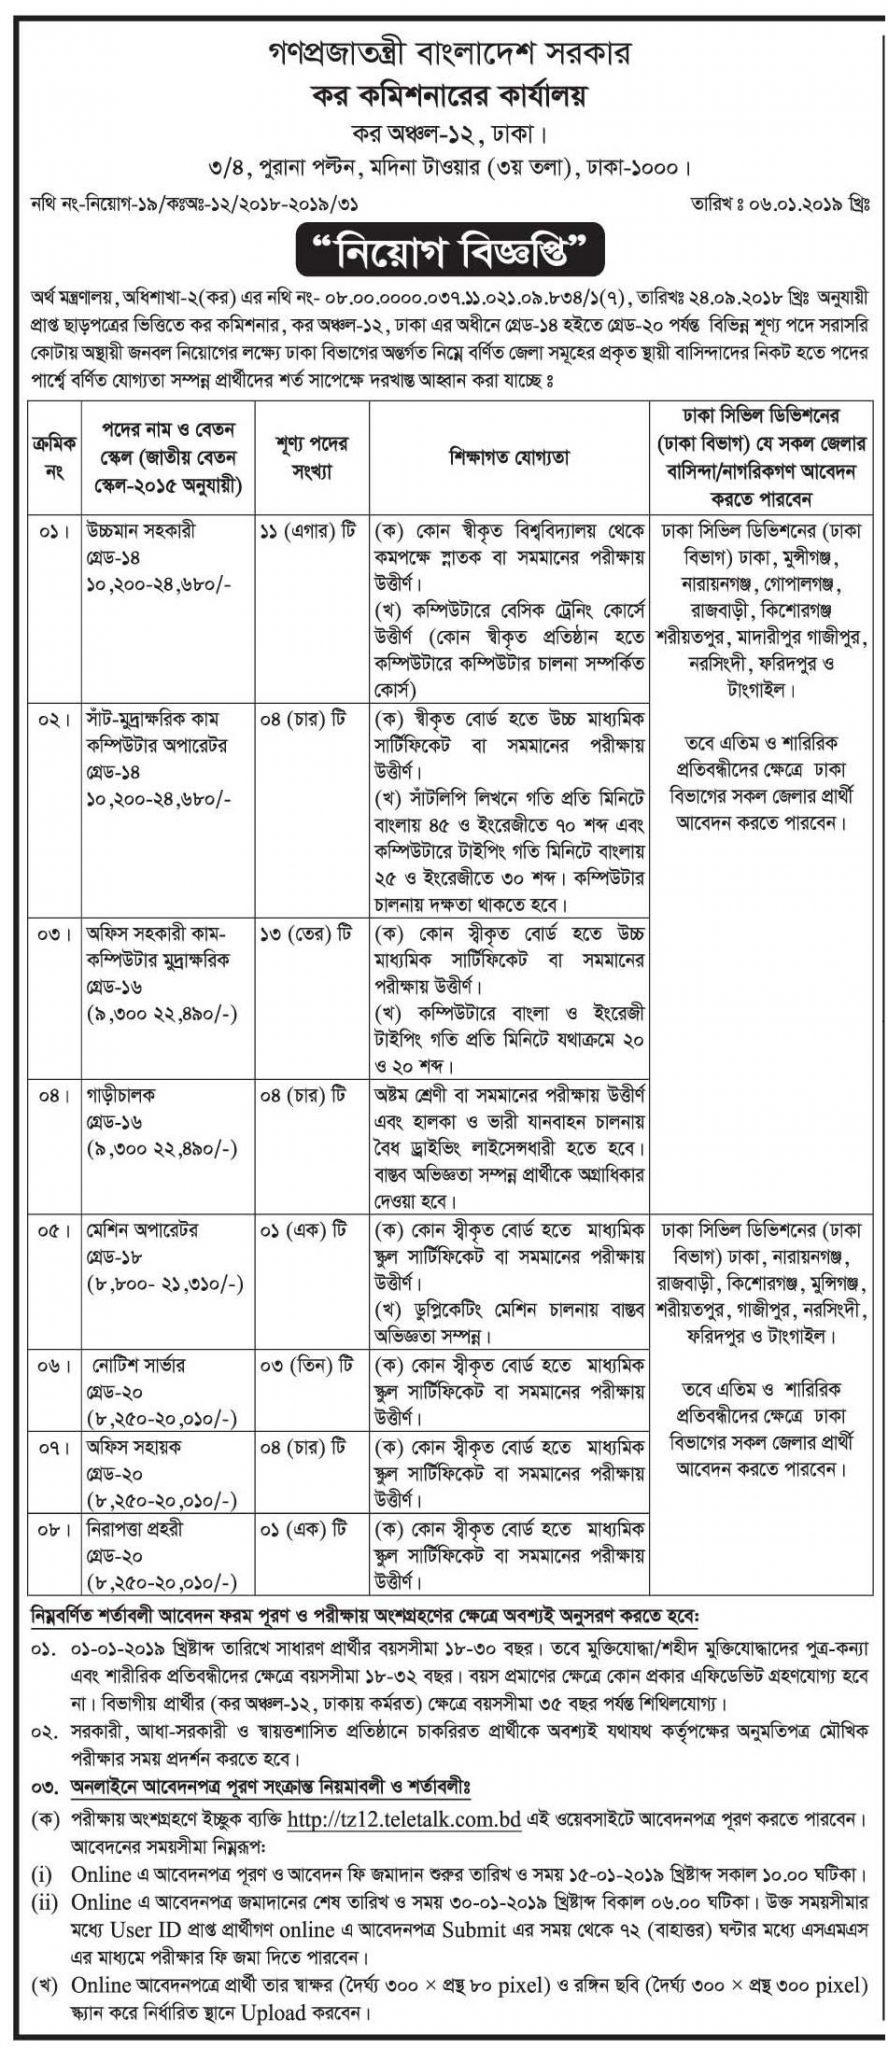 Tax Commissioner office Job Circular 2019